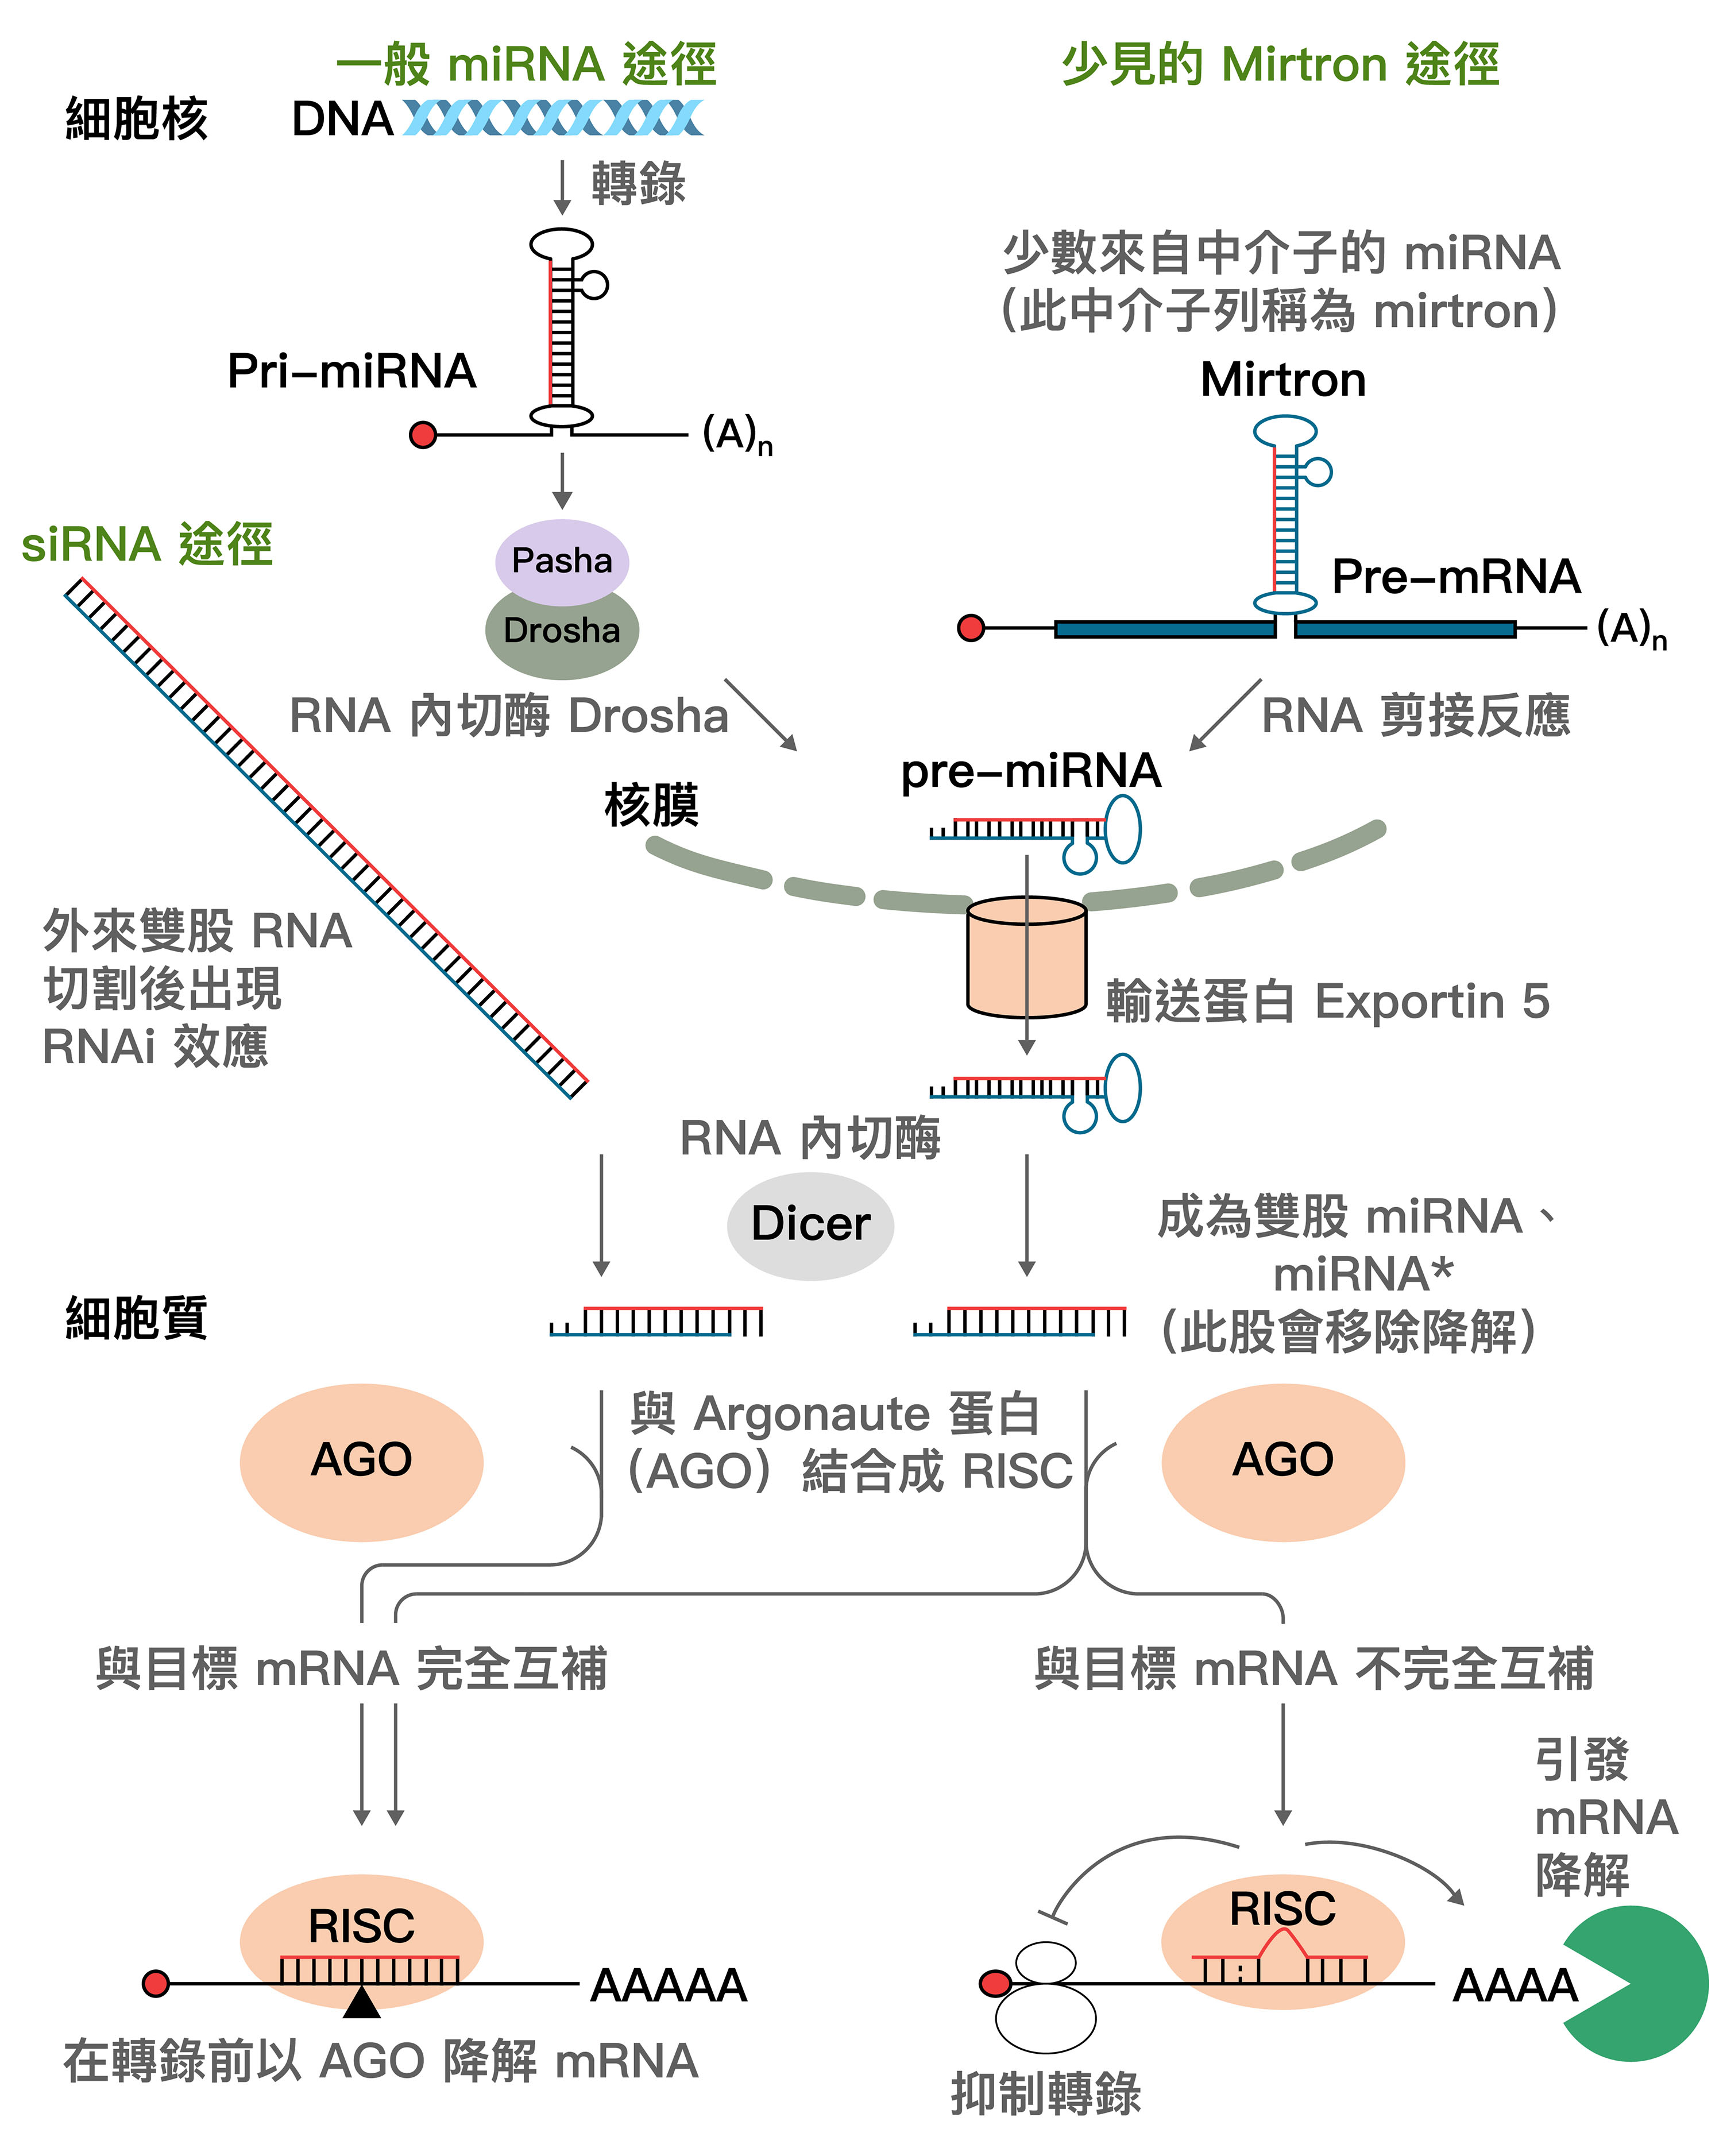 miRNA 和 siRNA 的生成與作用: 一般路徑: 1. DNA 與 RNA 聚合酶轉錄出上百至上千核苷酸長的 pri-miRNA,透過 Drosha 切割為 60~70 核苷酸長的 pre-miRNA。 2. pre-miRNA 經過輸送蛋白 exportin-5 進入細胞質,由 Dicer 切割為約 22 核苷酸長度的 miRNA 和互補股 miRNA* (將被移除降解的一股)。 3. miRNA 和 AGO 蛋白結合成 RISC ,尋找並結合目標 mRNA。完美結合就可以迅速切斷、降解 mRNA。結合不完全,形成突起 (bulge) 的話,就會抑制核糖體轉錄功能,進而由 來自 RISC 的去腺嘧啶酶(deadenylase) 複合物降解 mRNA。 ----- 較少見的 Mirtron 路徑 (右上): 1.來自中介子 (intron) 的 miRNA 序列,不經過 Drosha,而是由 RNA 剪接反應形成 pre-miRNA。此後的步驟與一般路徑相同。 ----- siRNA 路徑 (左): 1. 外來雙股 DNA 進入細胞質,由 Dicer 切割為數十核苷酸長度的雙股 RNA 。 2. 其中一股與 AGO 等蛋白組成 RISC,可以和目標 mRNA 完美結合,並將其切斷降解。 資料來源│詹世鵬,2010。〈小兵立大功─ 微小核醣核酸與小干擾核醣核酸〉,《化學》,68 (4),303 - 312。 圖說重製│林任遠、張語辰